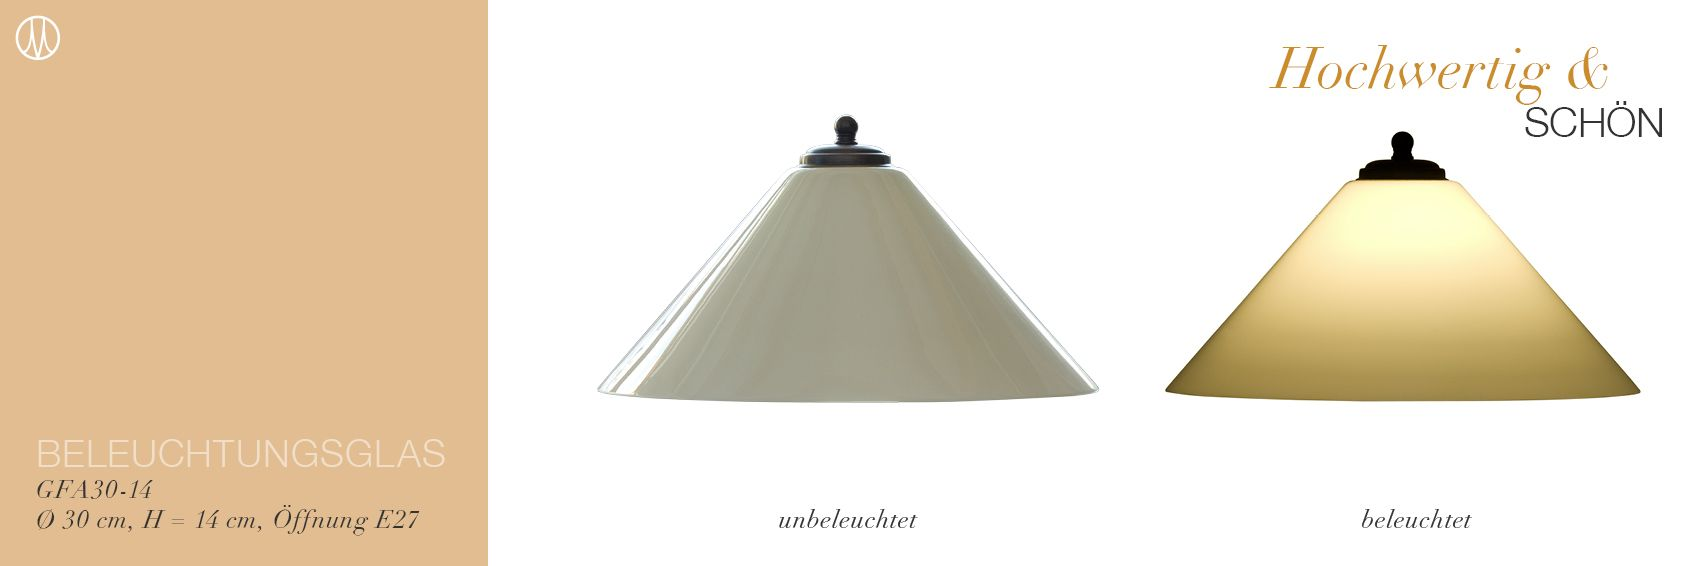 Beleuchtungsglas Leuchtenglas Als Zubehor Ersatzteil Beleuchtung Glas Beleuchten